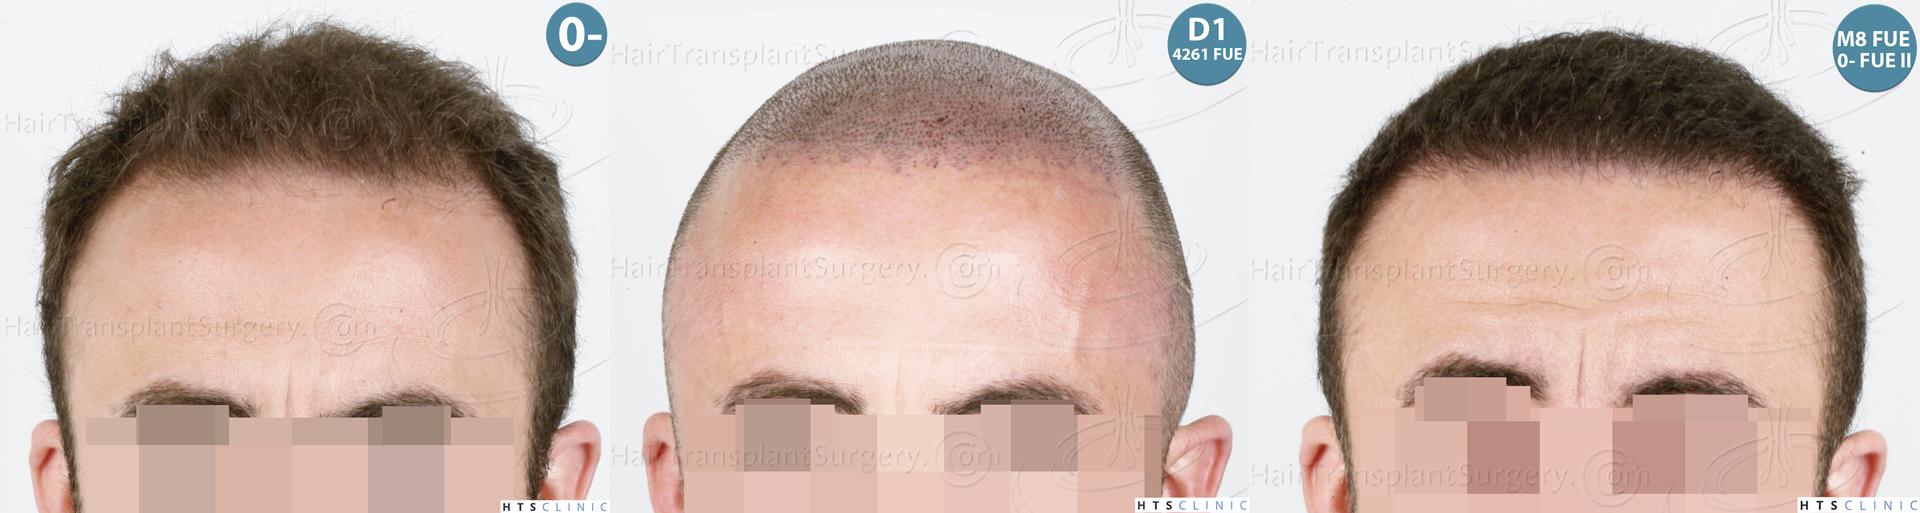 Dr.Devroye-HTS-Clinic-6326-FUE-_4261_2065_-Montage-1.jpg